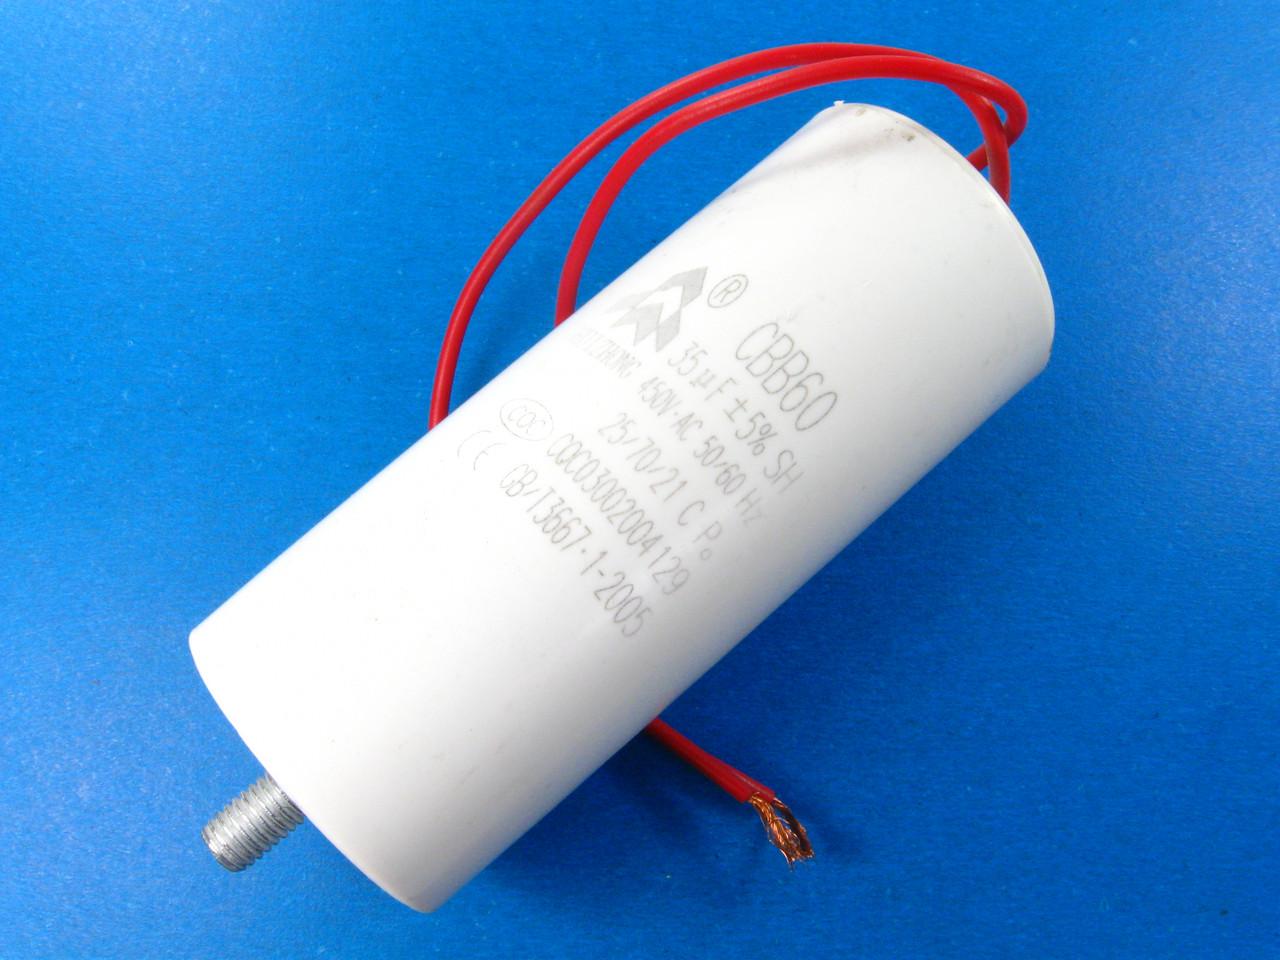 Конденсатор воздушного компрессора 35 мкФ CBB60 шпилька